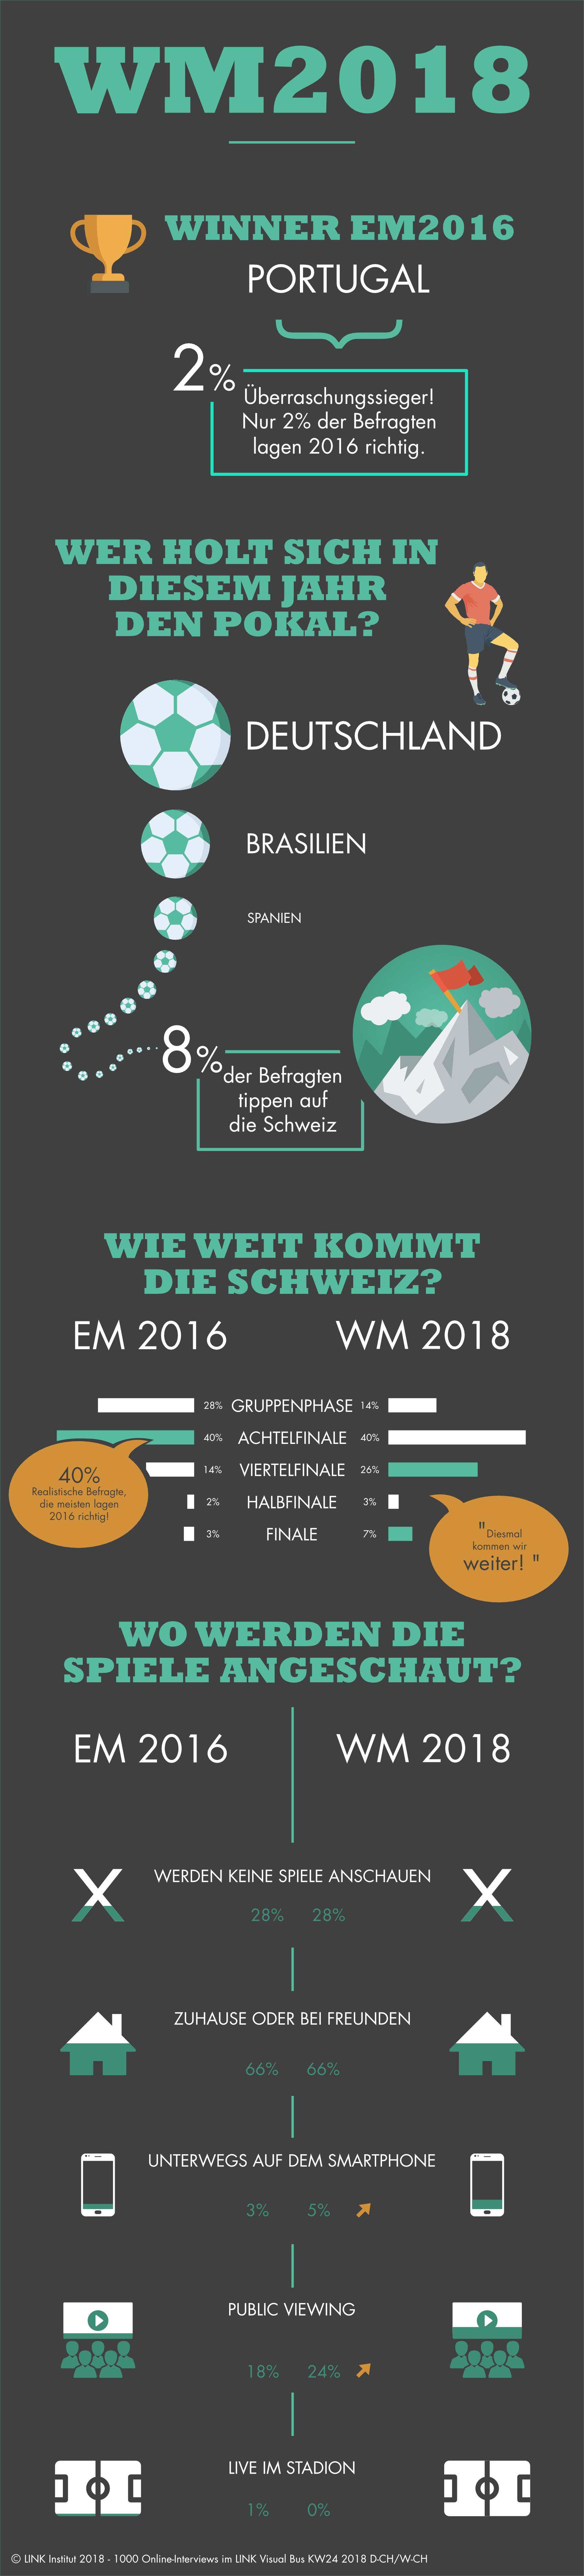 WM2018_Infografik